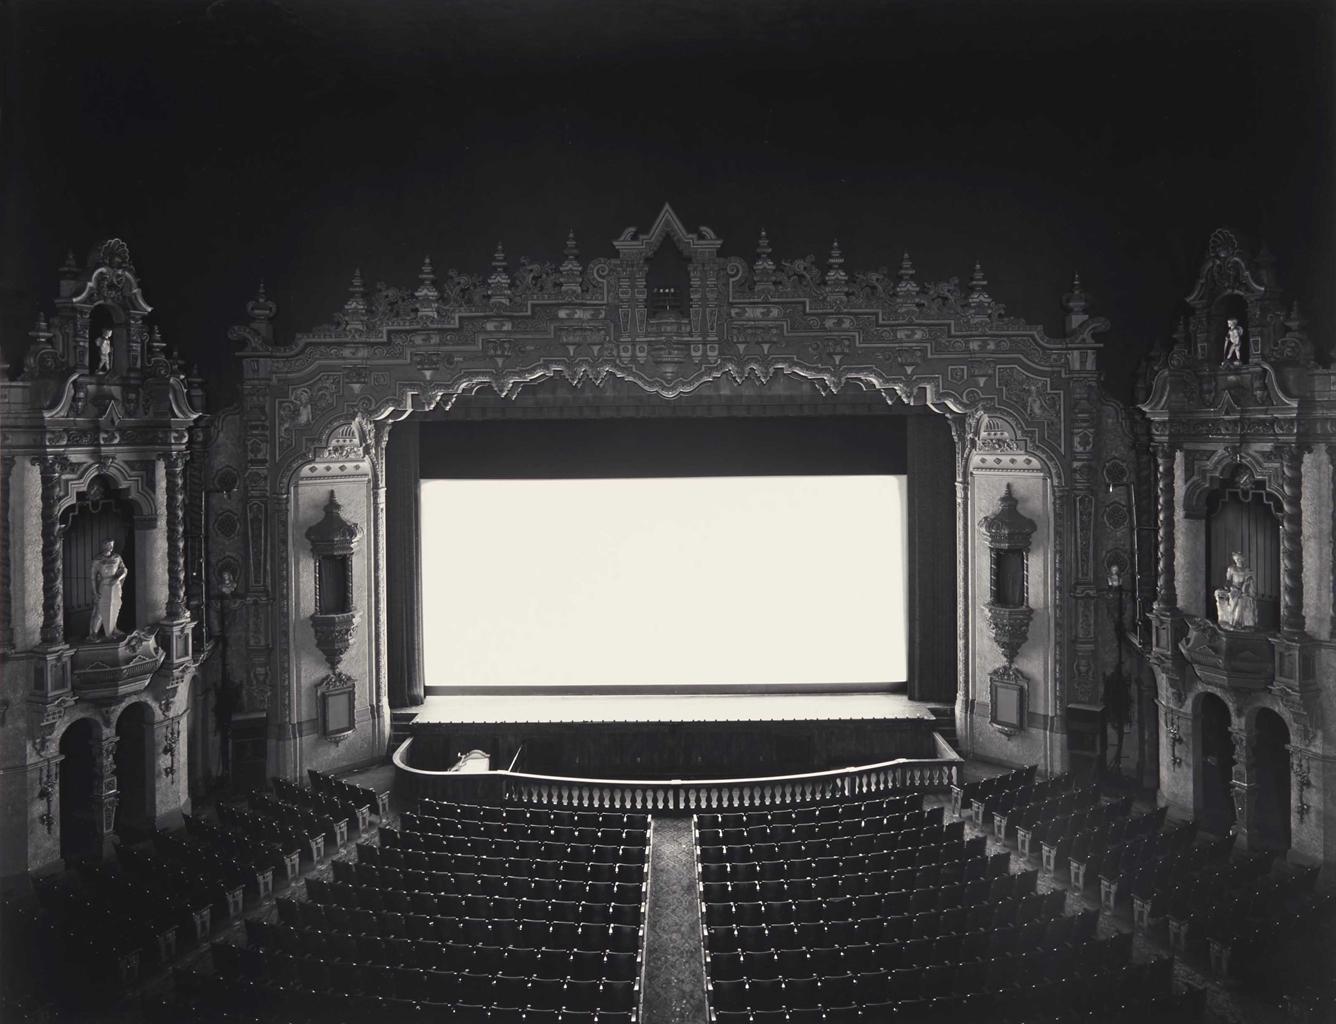 Hiroshi Sugimoto-Akron Civic Theatre, Ohio-1980